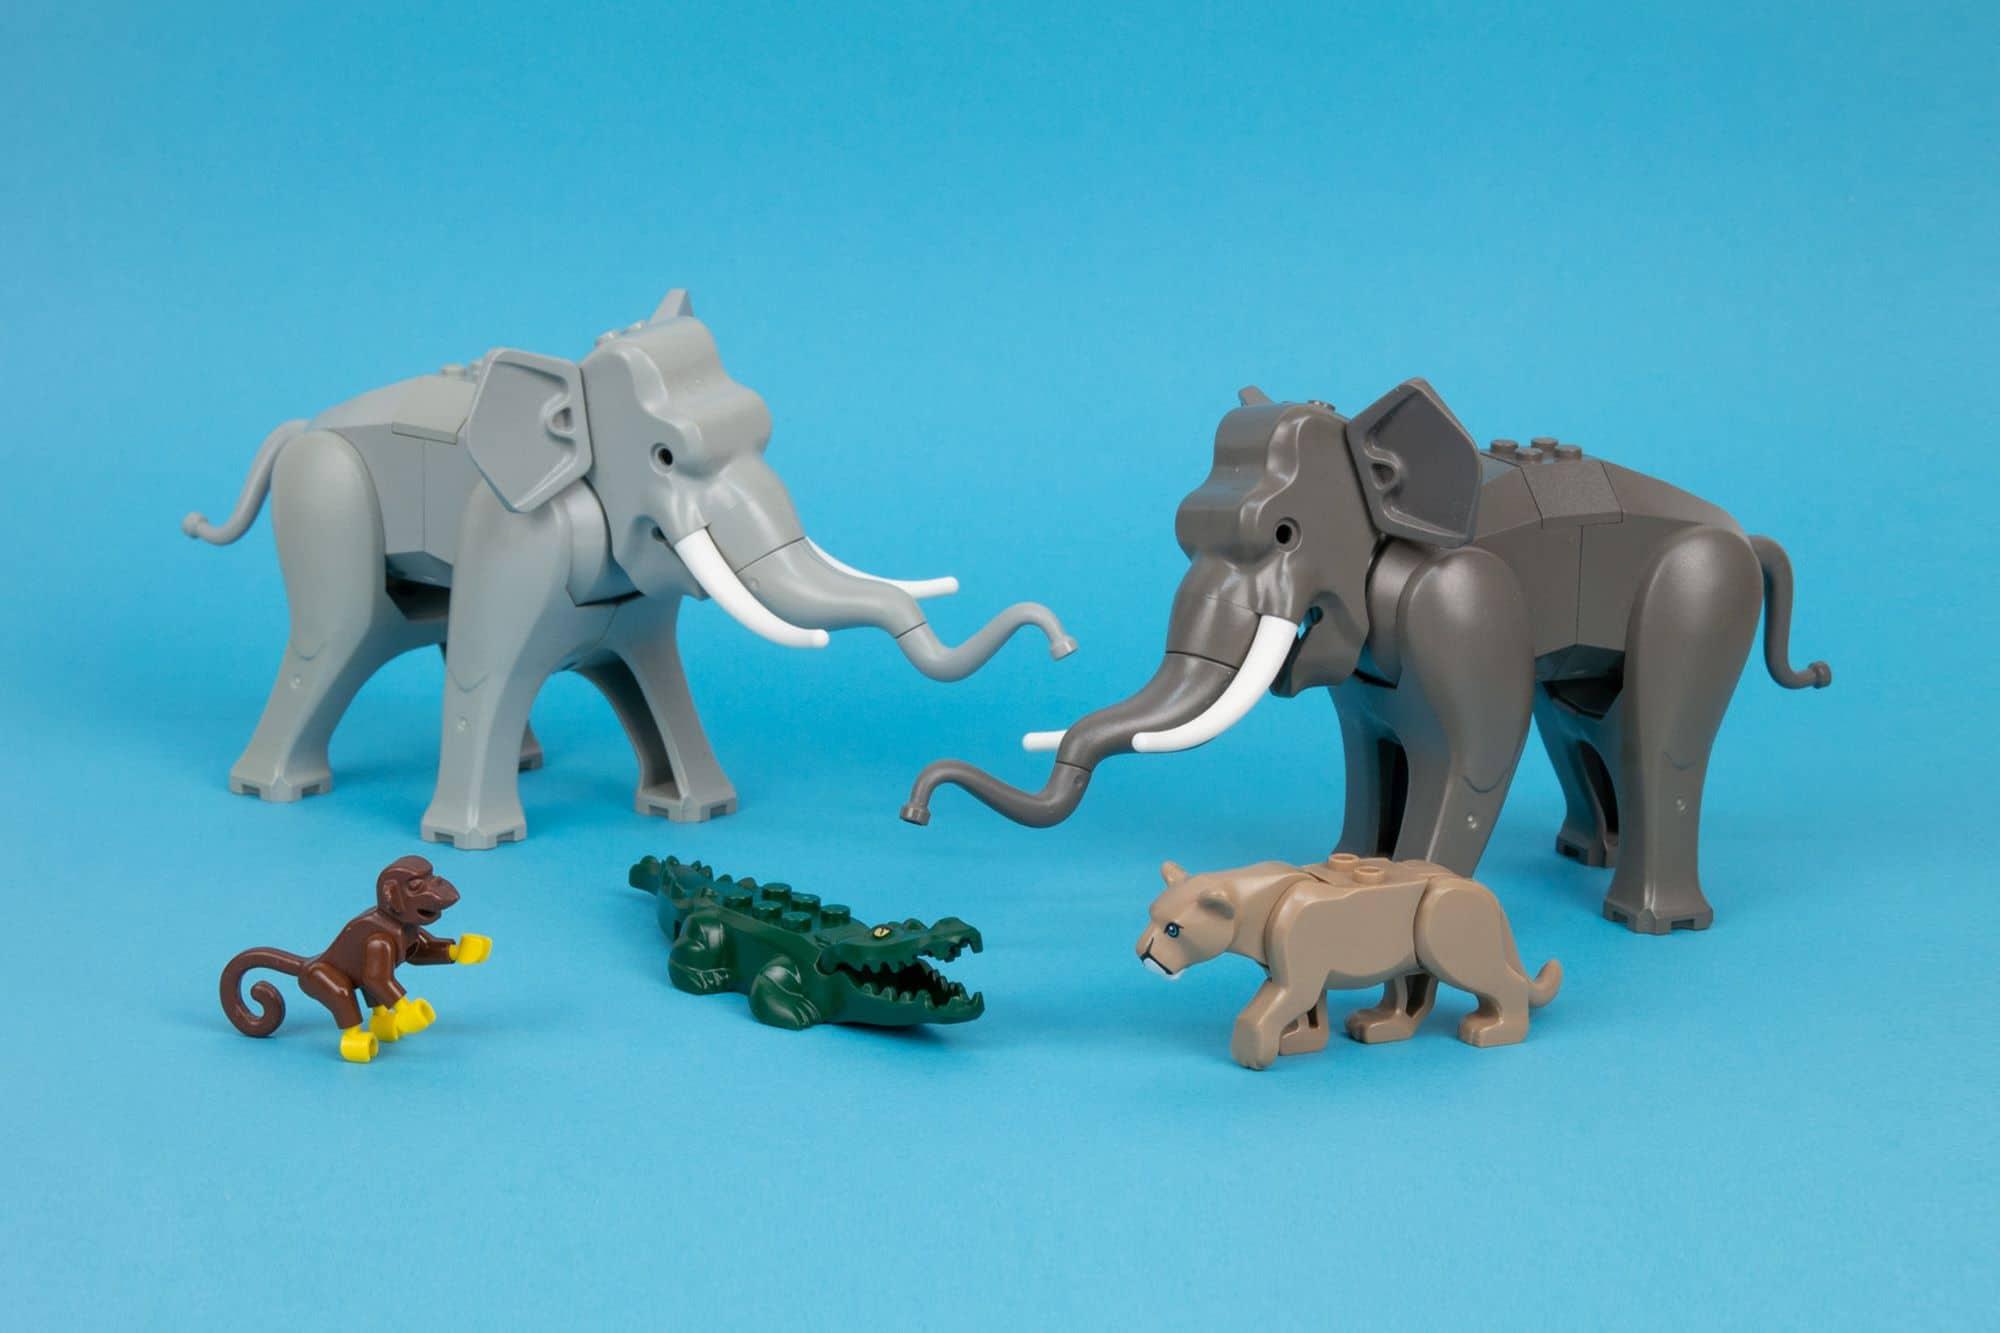 LEGO City 2021 Tierrettung Elefanten Platzhalter